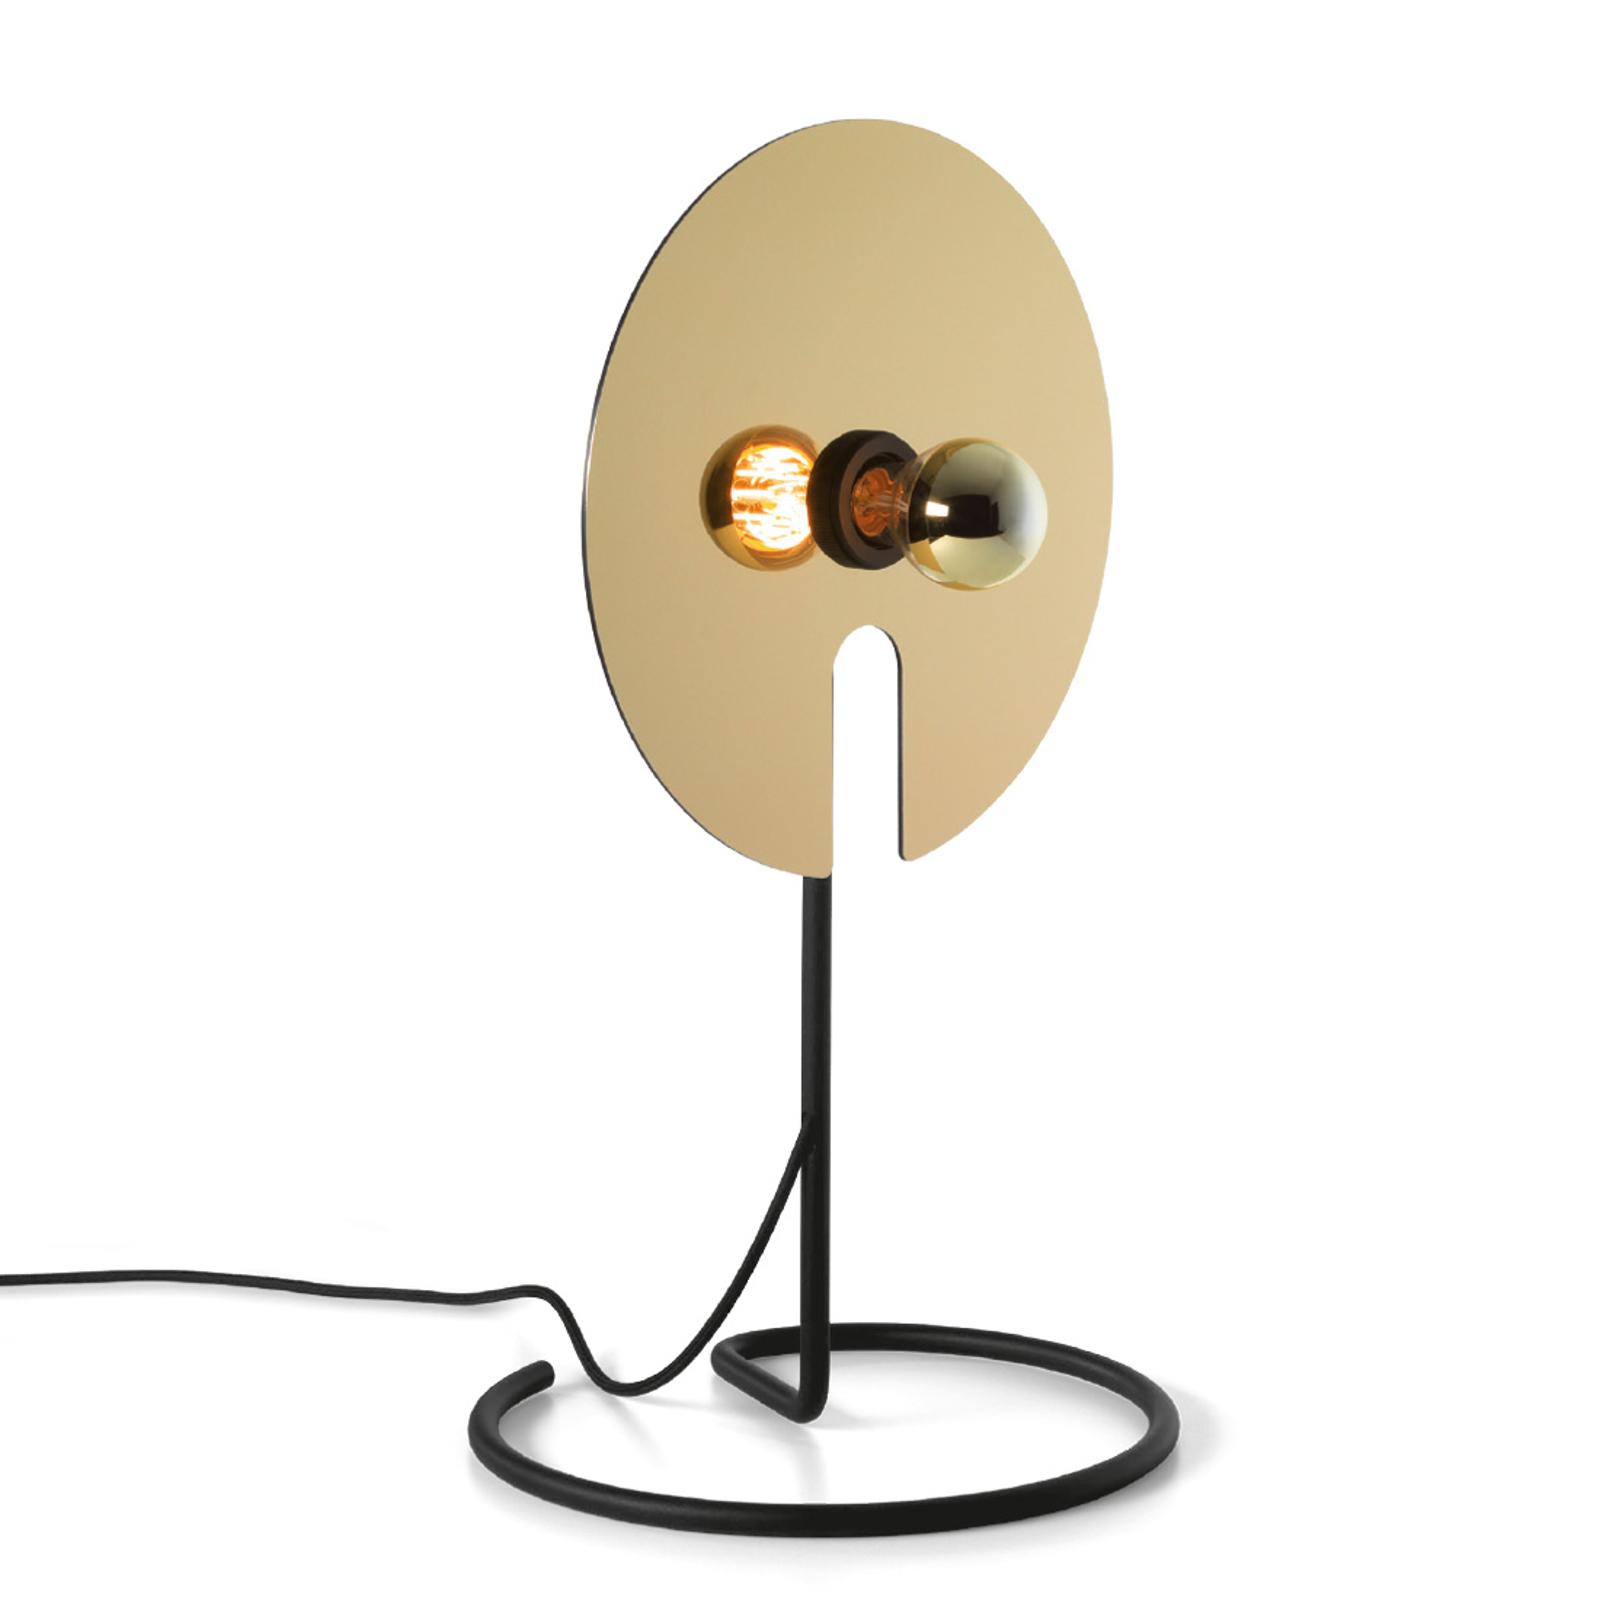 WEVER & DUCRÉ Mirro tafellamp 1.0 zwart/goud